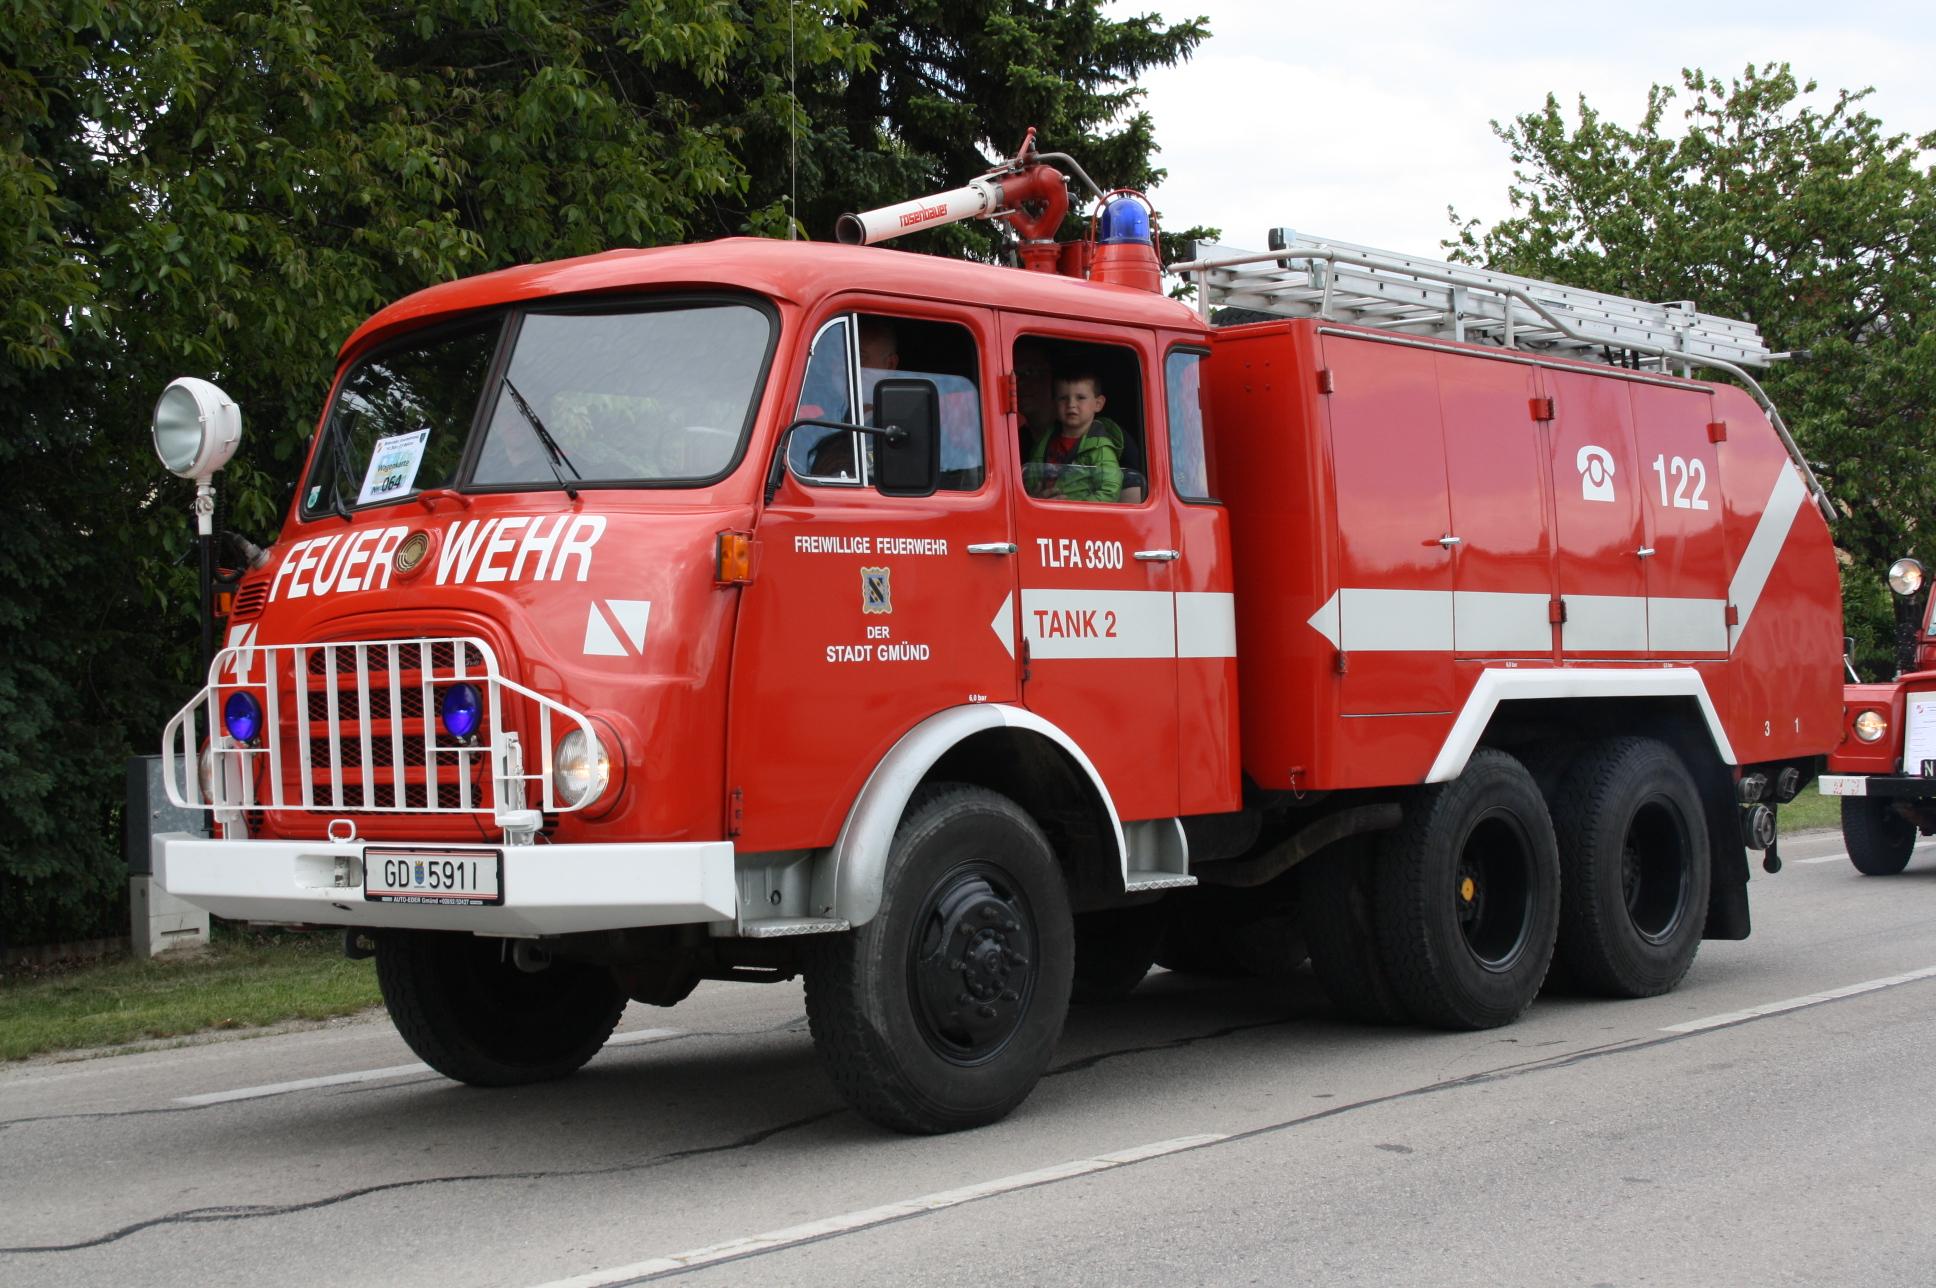 file fire engine of gm nd lower austria wikimedia. Black Bedroom Furniture Sets. Home Design Ideas